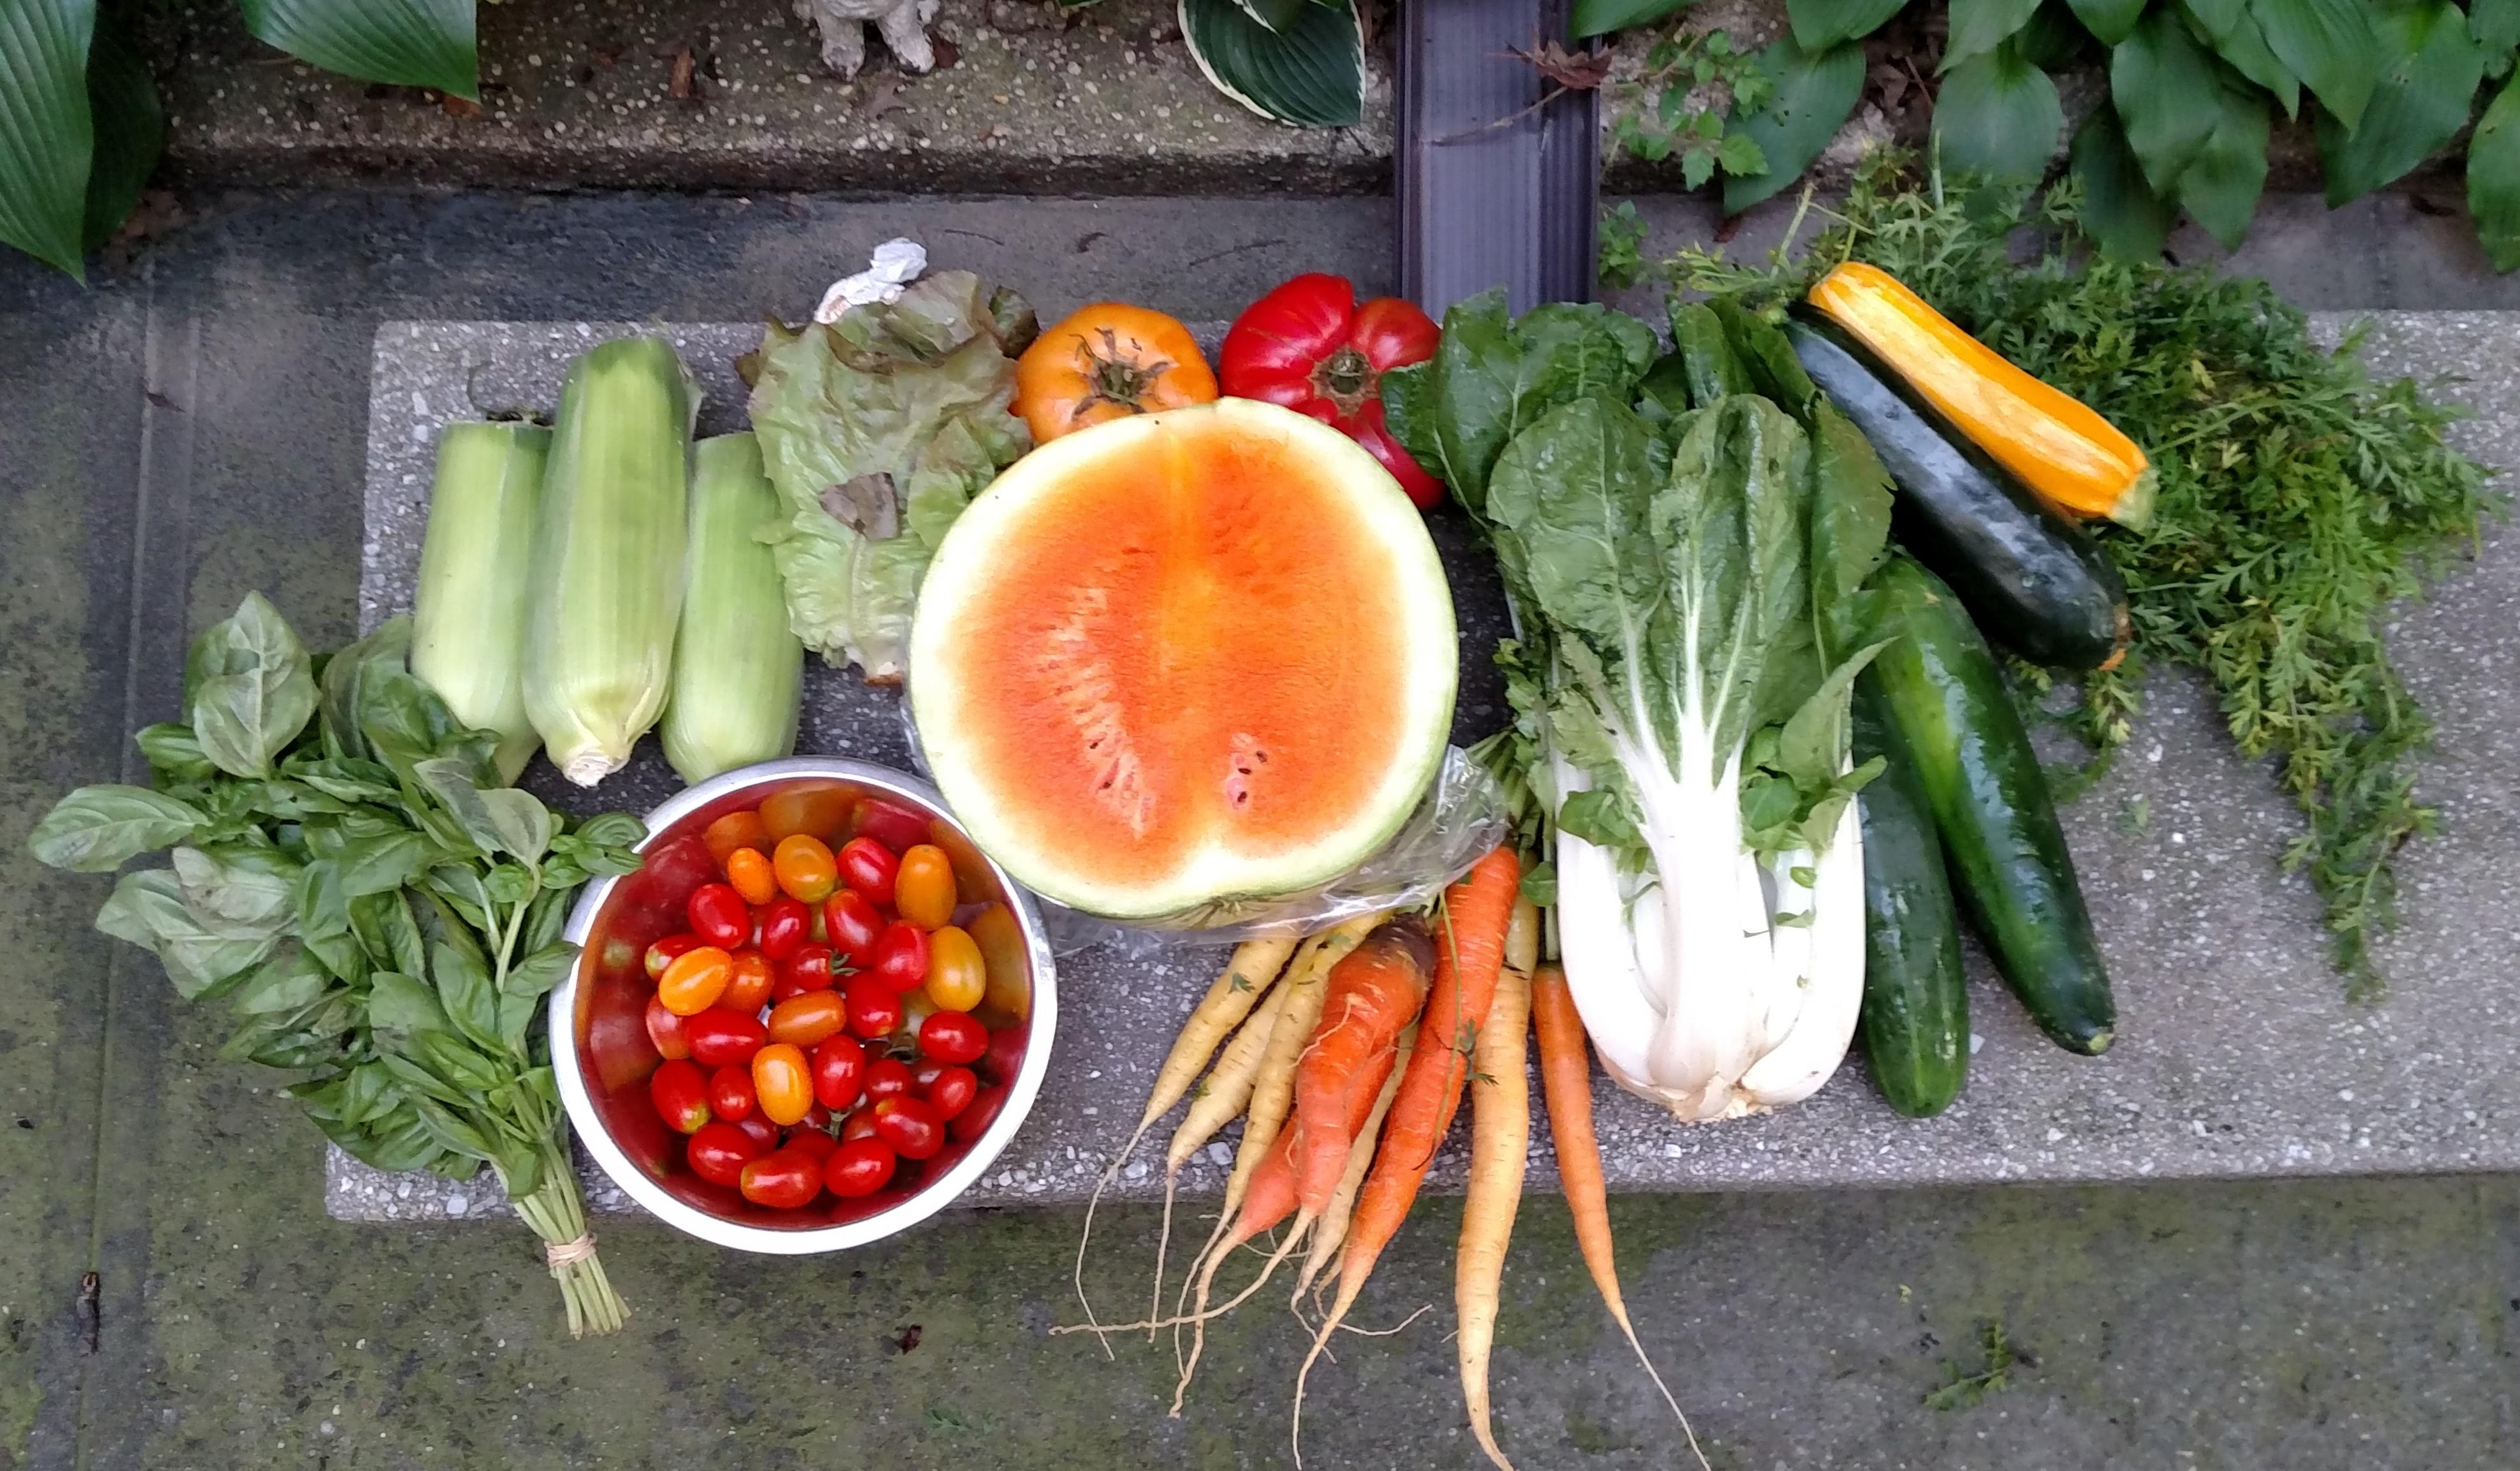 Love fresh veggies?? Join the Brooklyn Bridge CSA